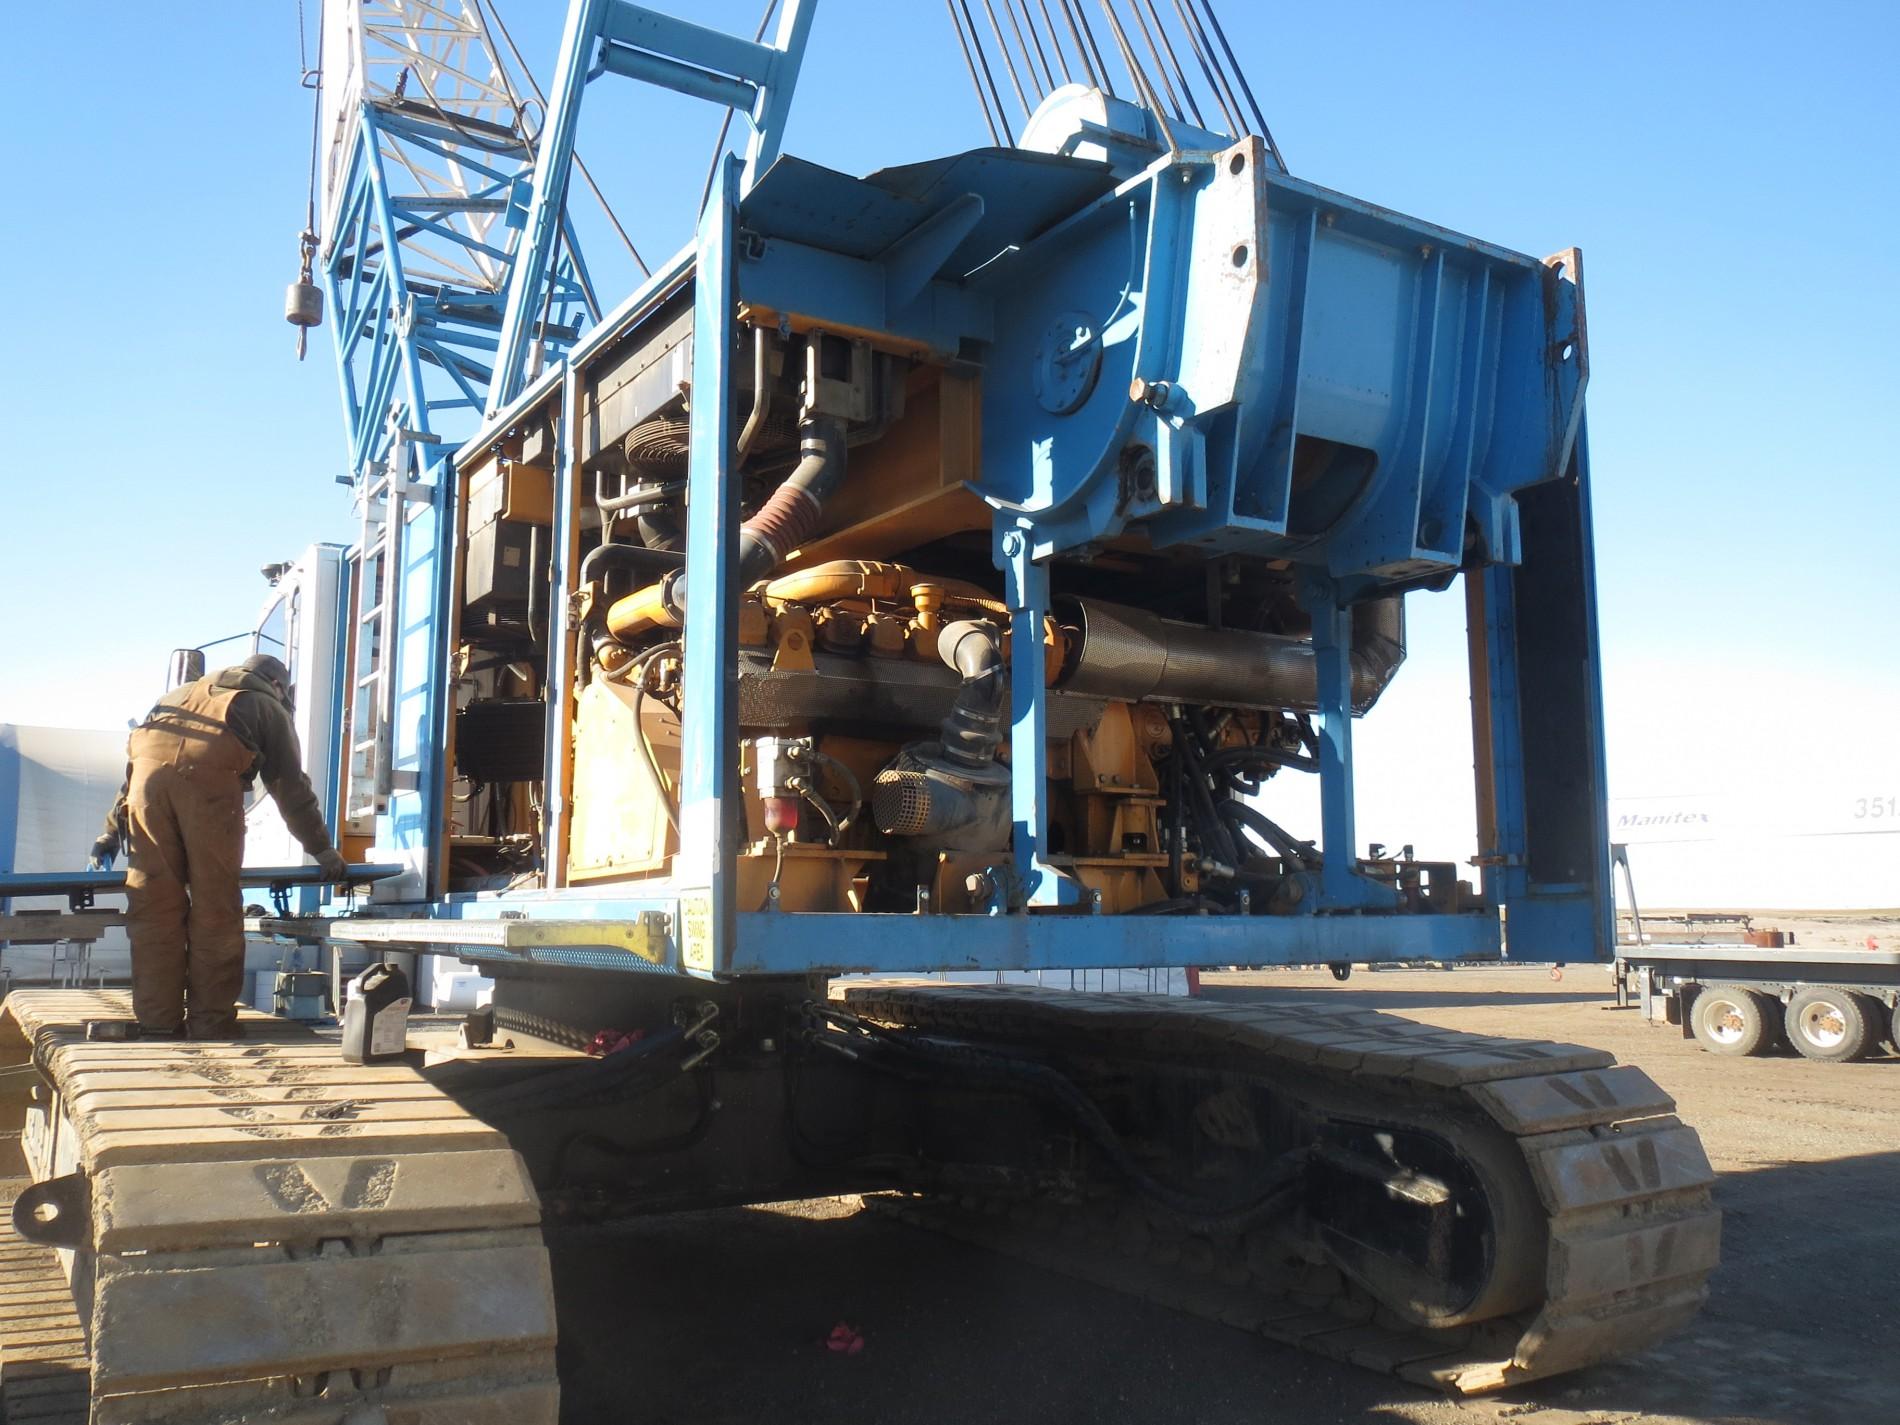 WHECO Richland, WA – Liebherr HS 883 HD Crane